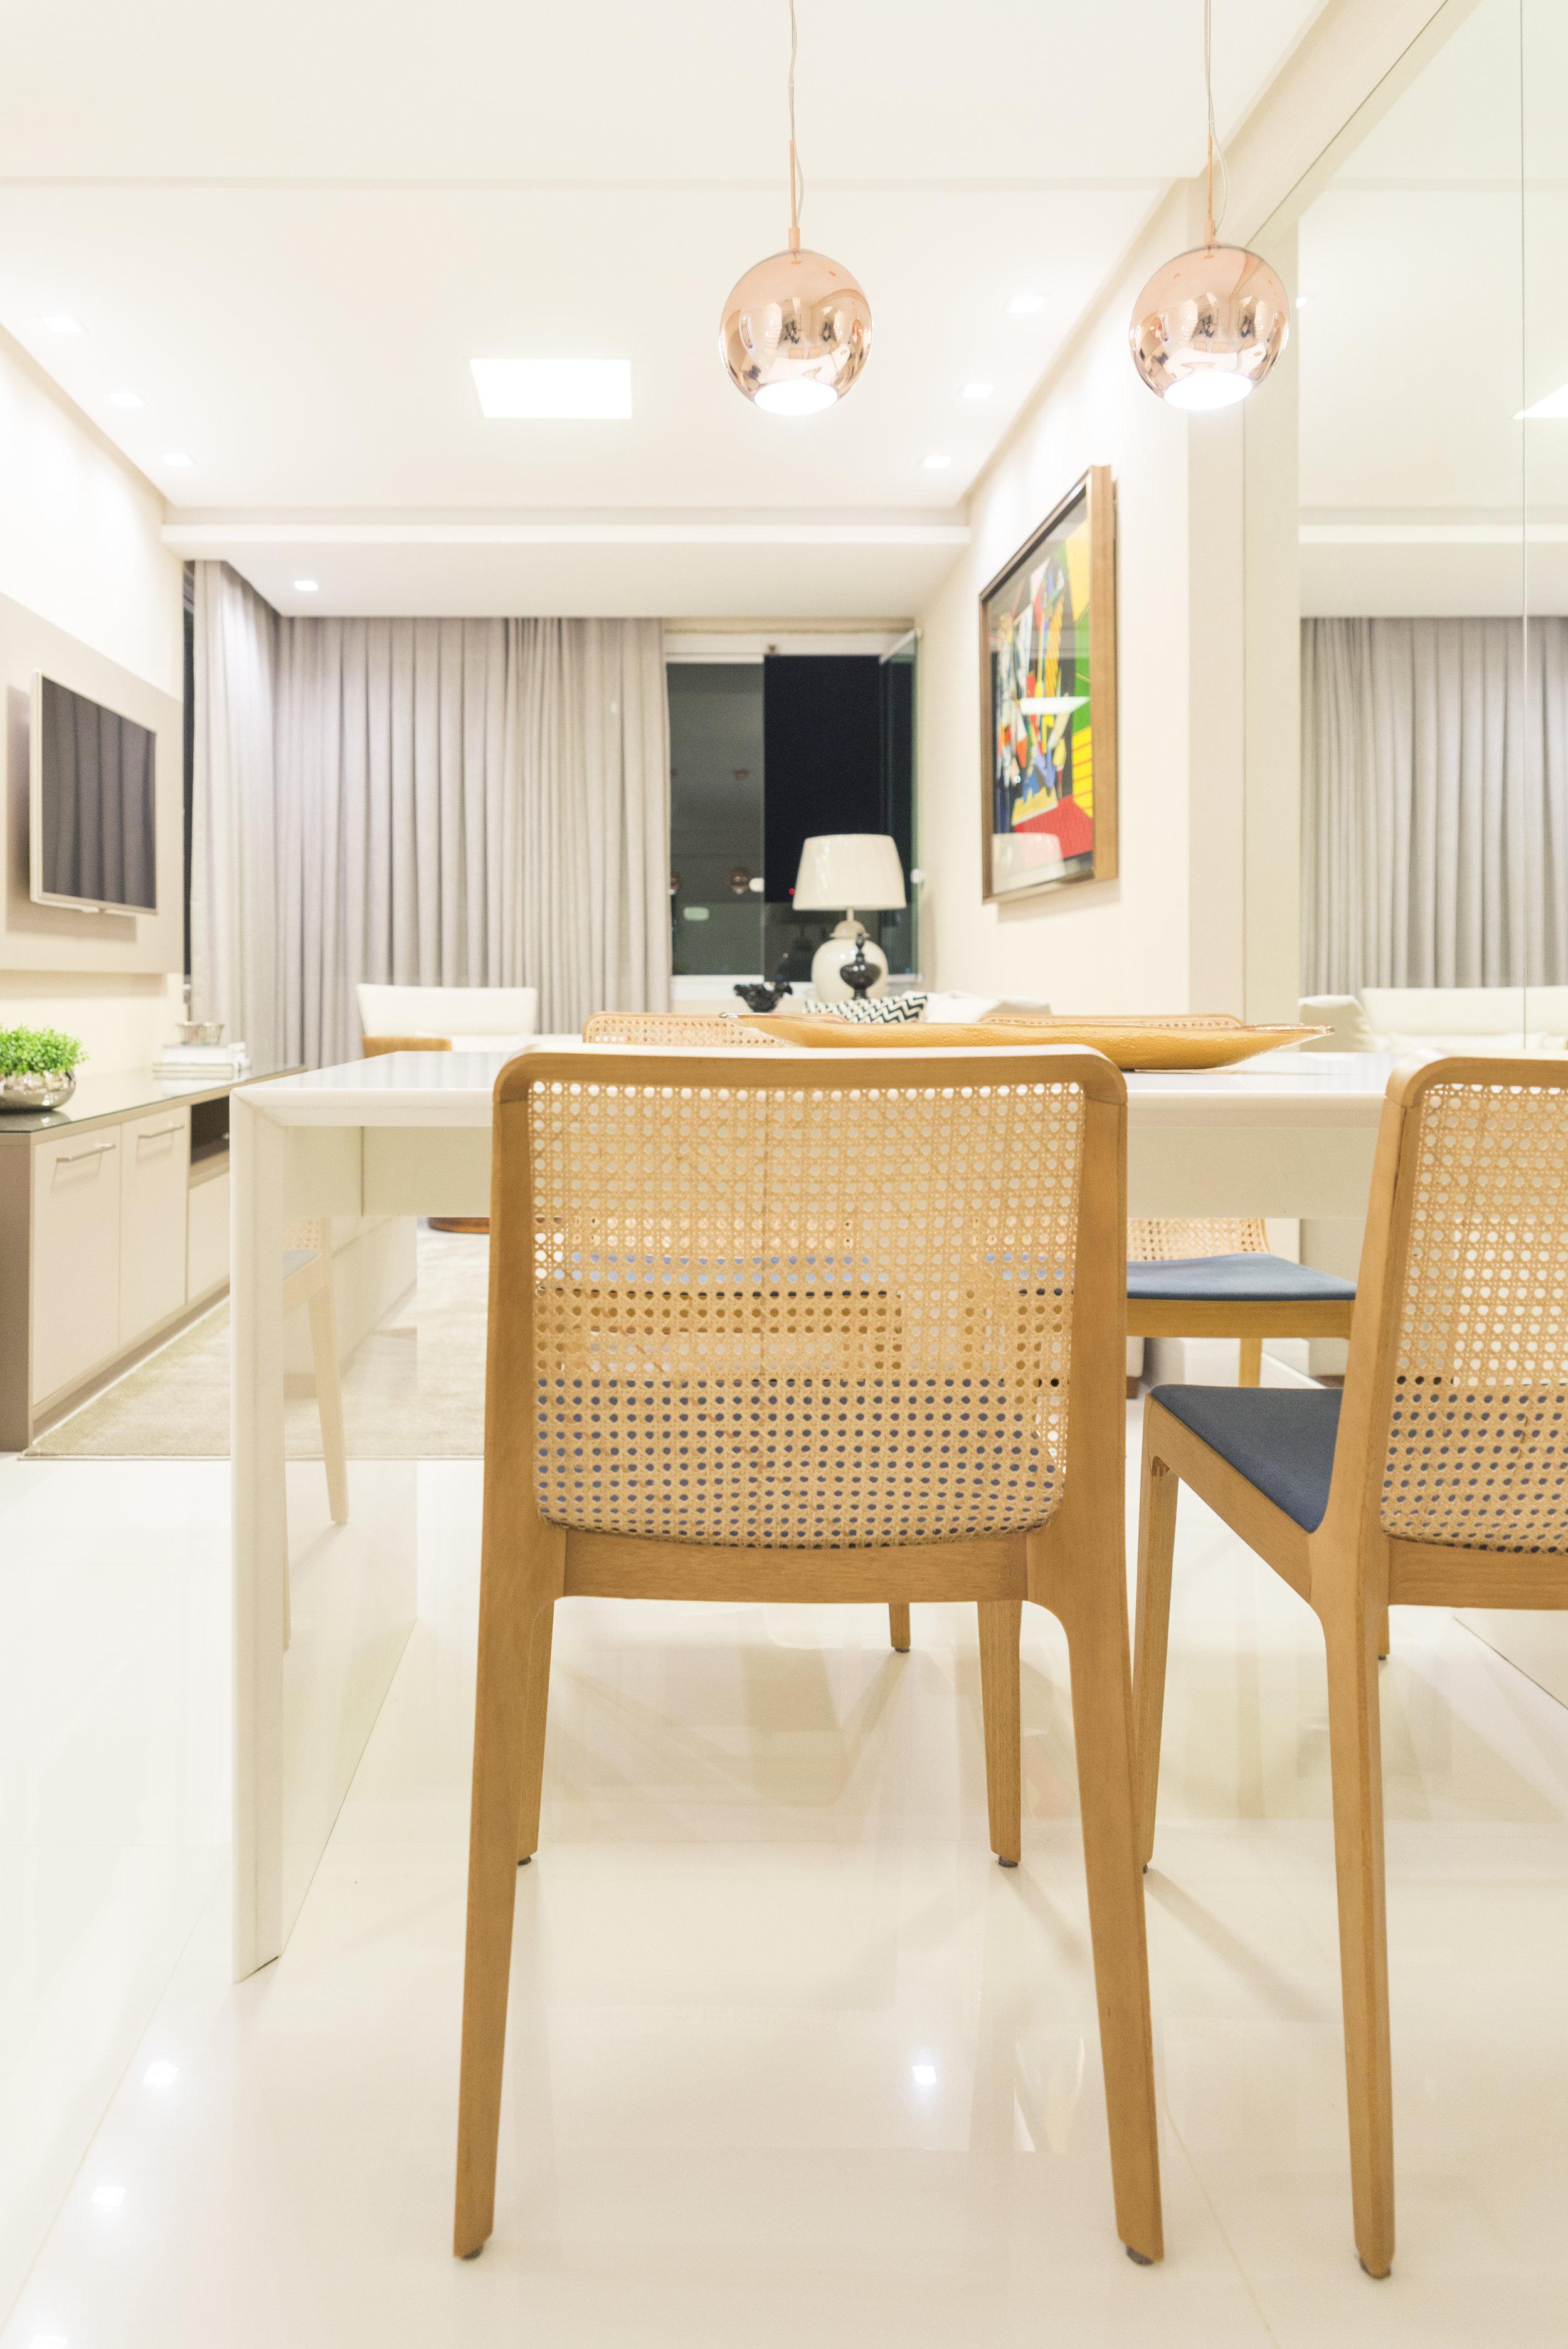 projeto-arquitetonico-robertoindira-duo-arquitetura-apartamentos-estar-010.jpg